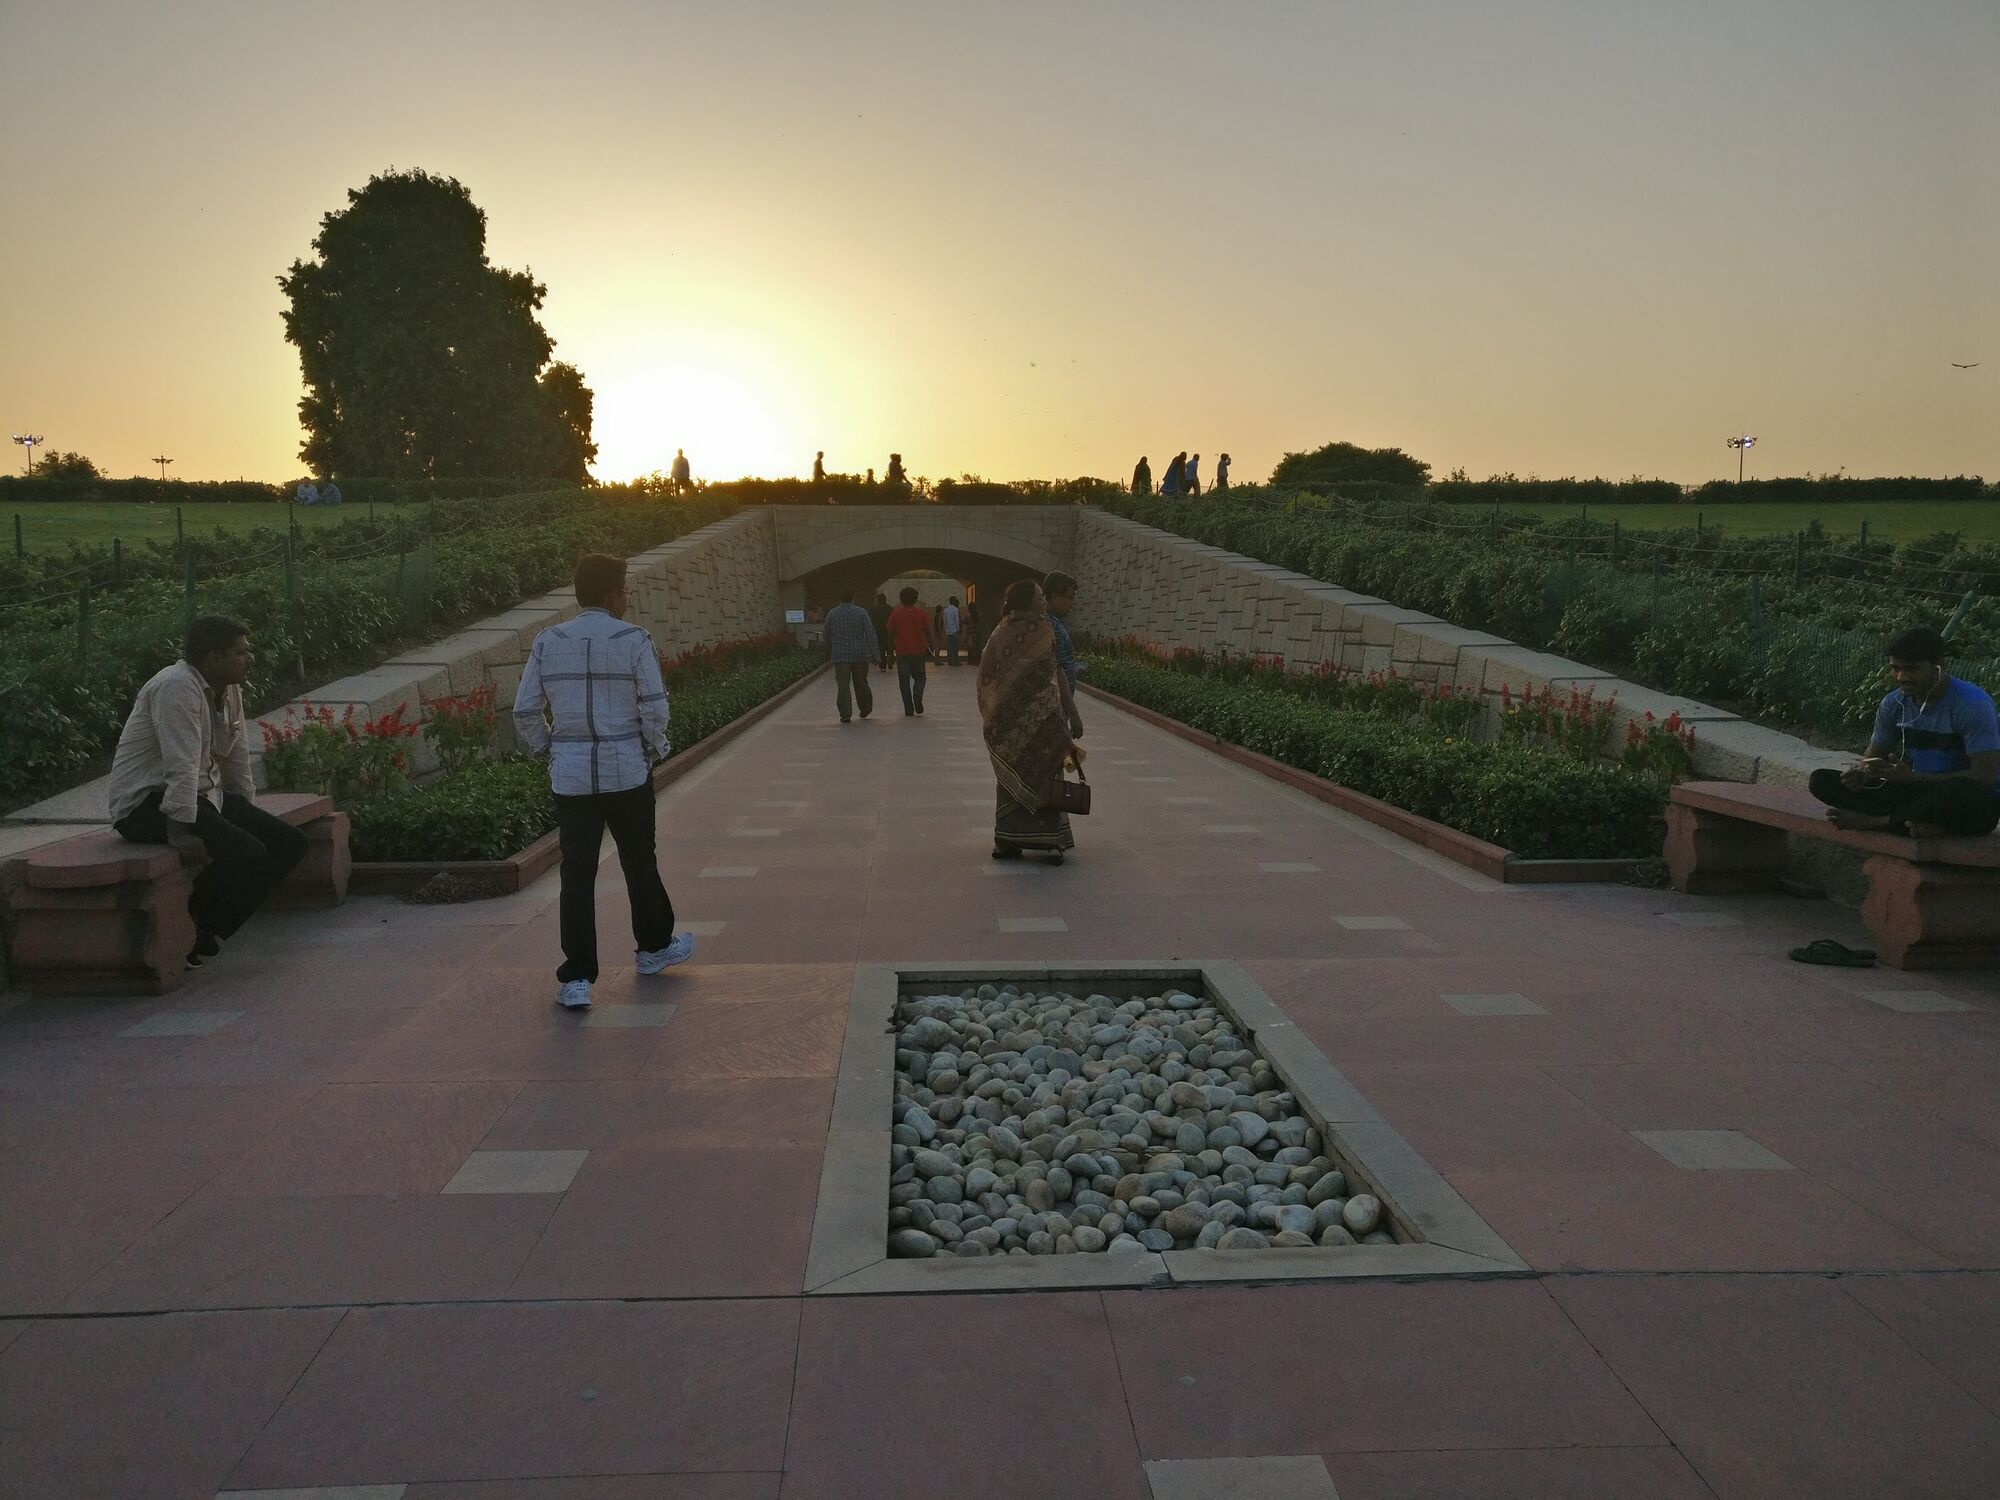 The pathway leading to Mahatma Gandhi's memorial